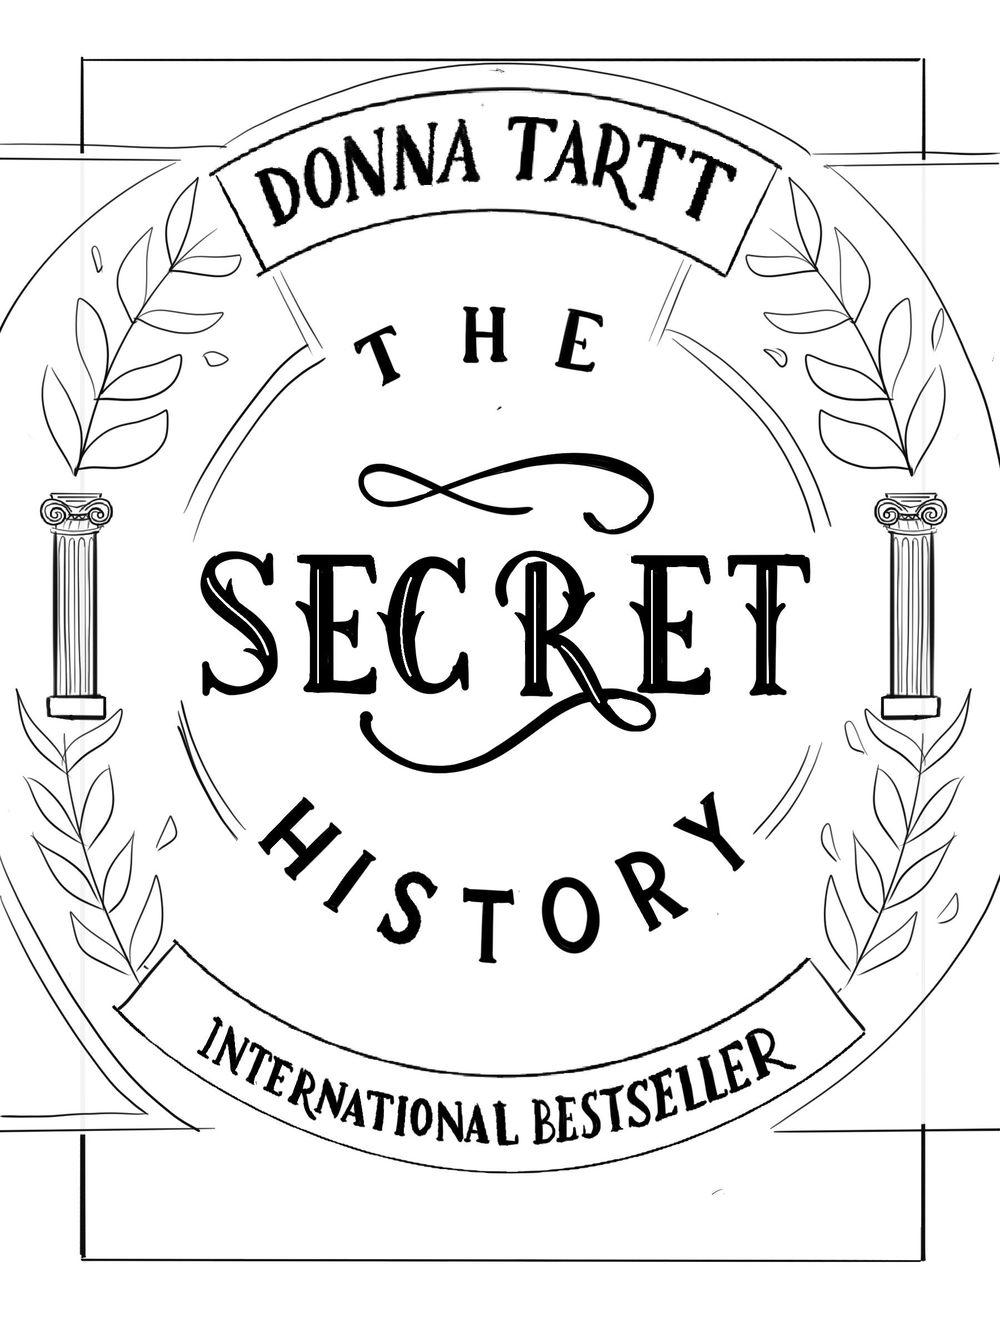 Donna Tartt - The secret history - image 7 - student project